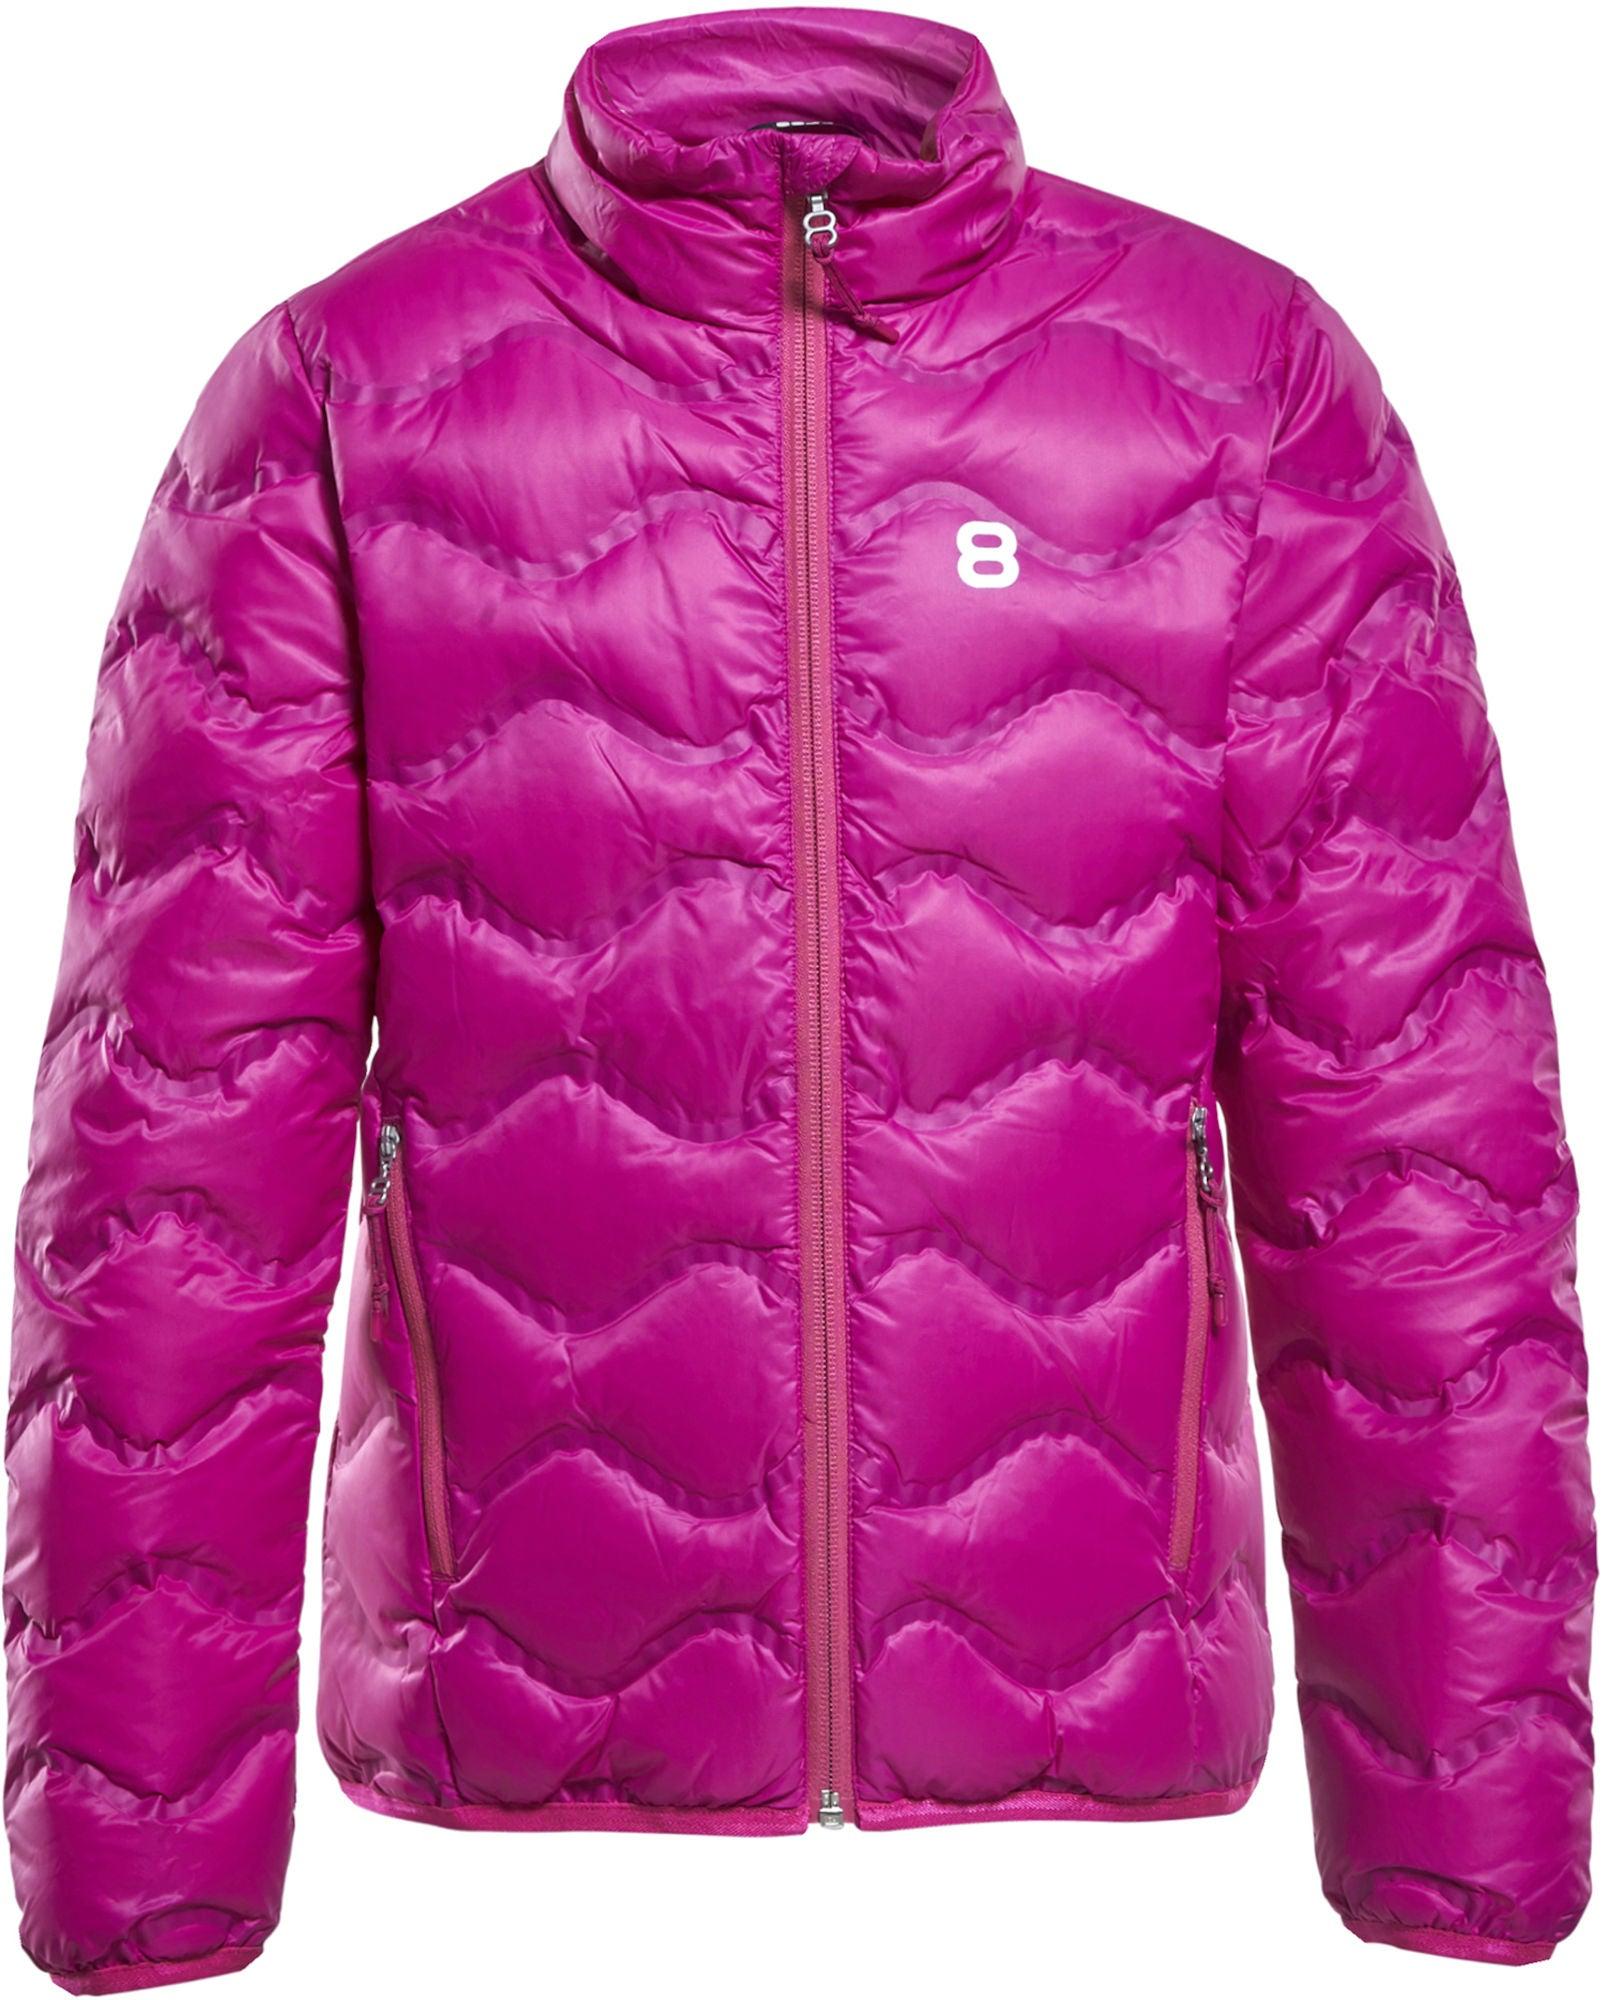 8848 Altitude Roman Jacka, Pink 160